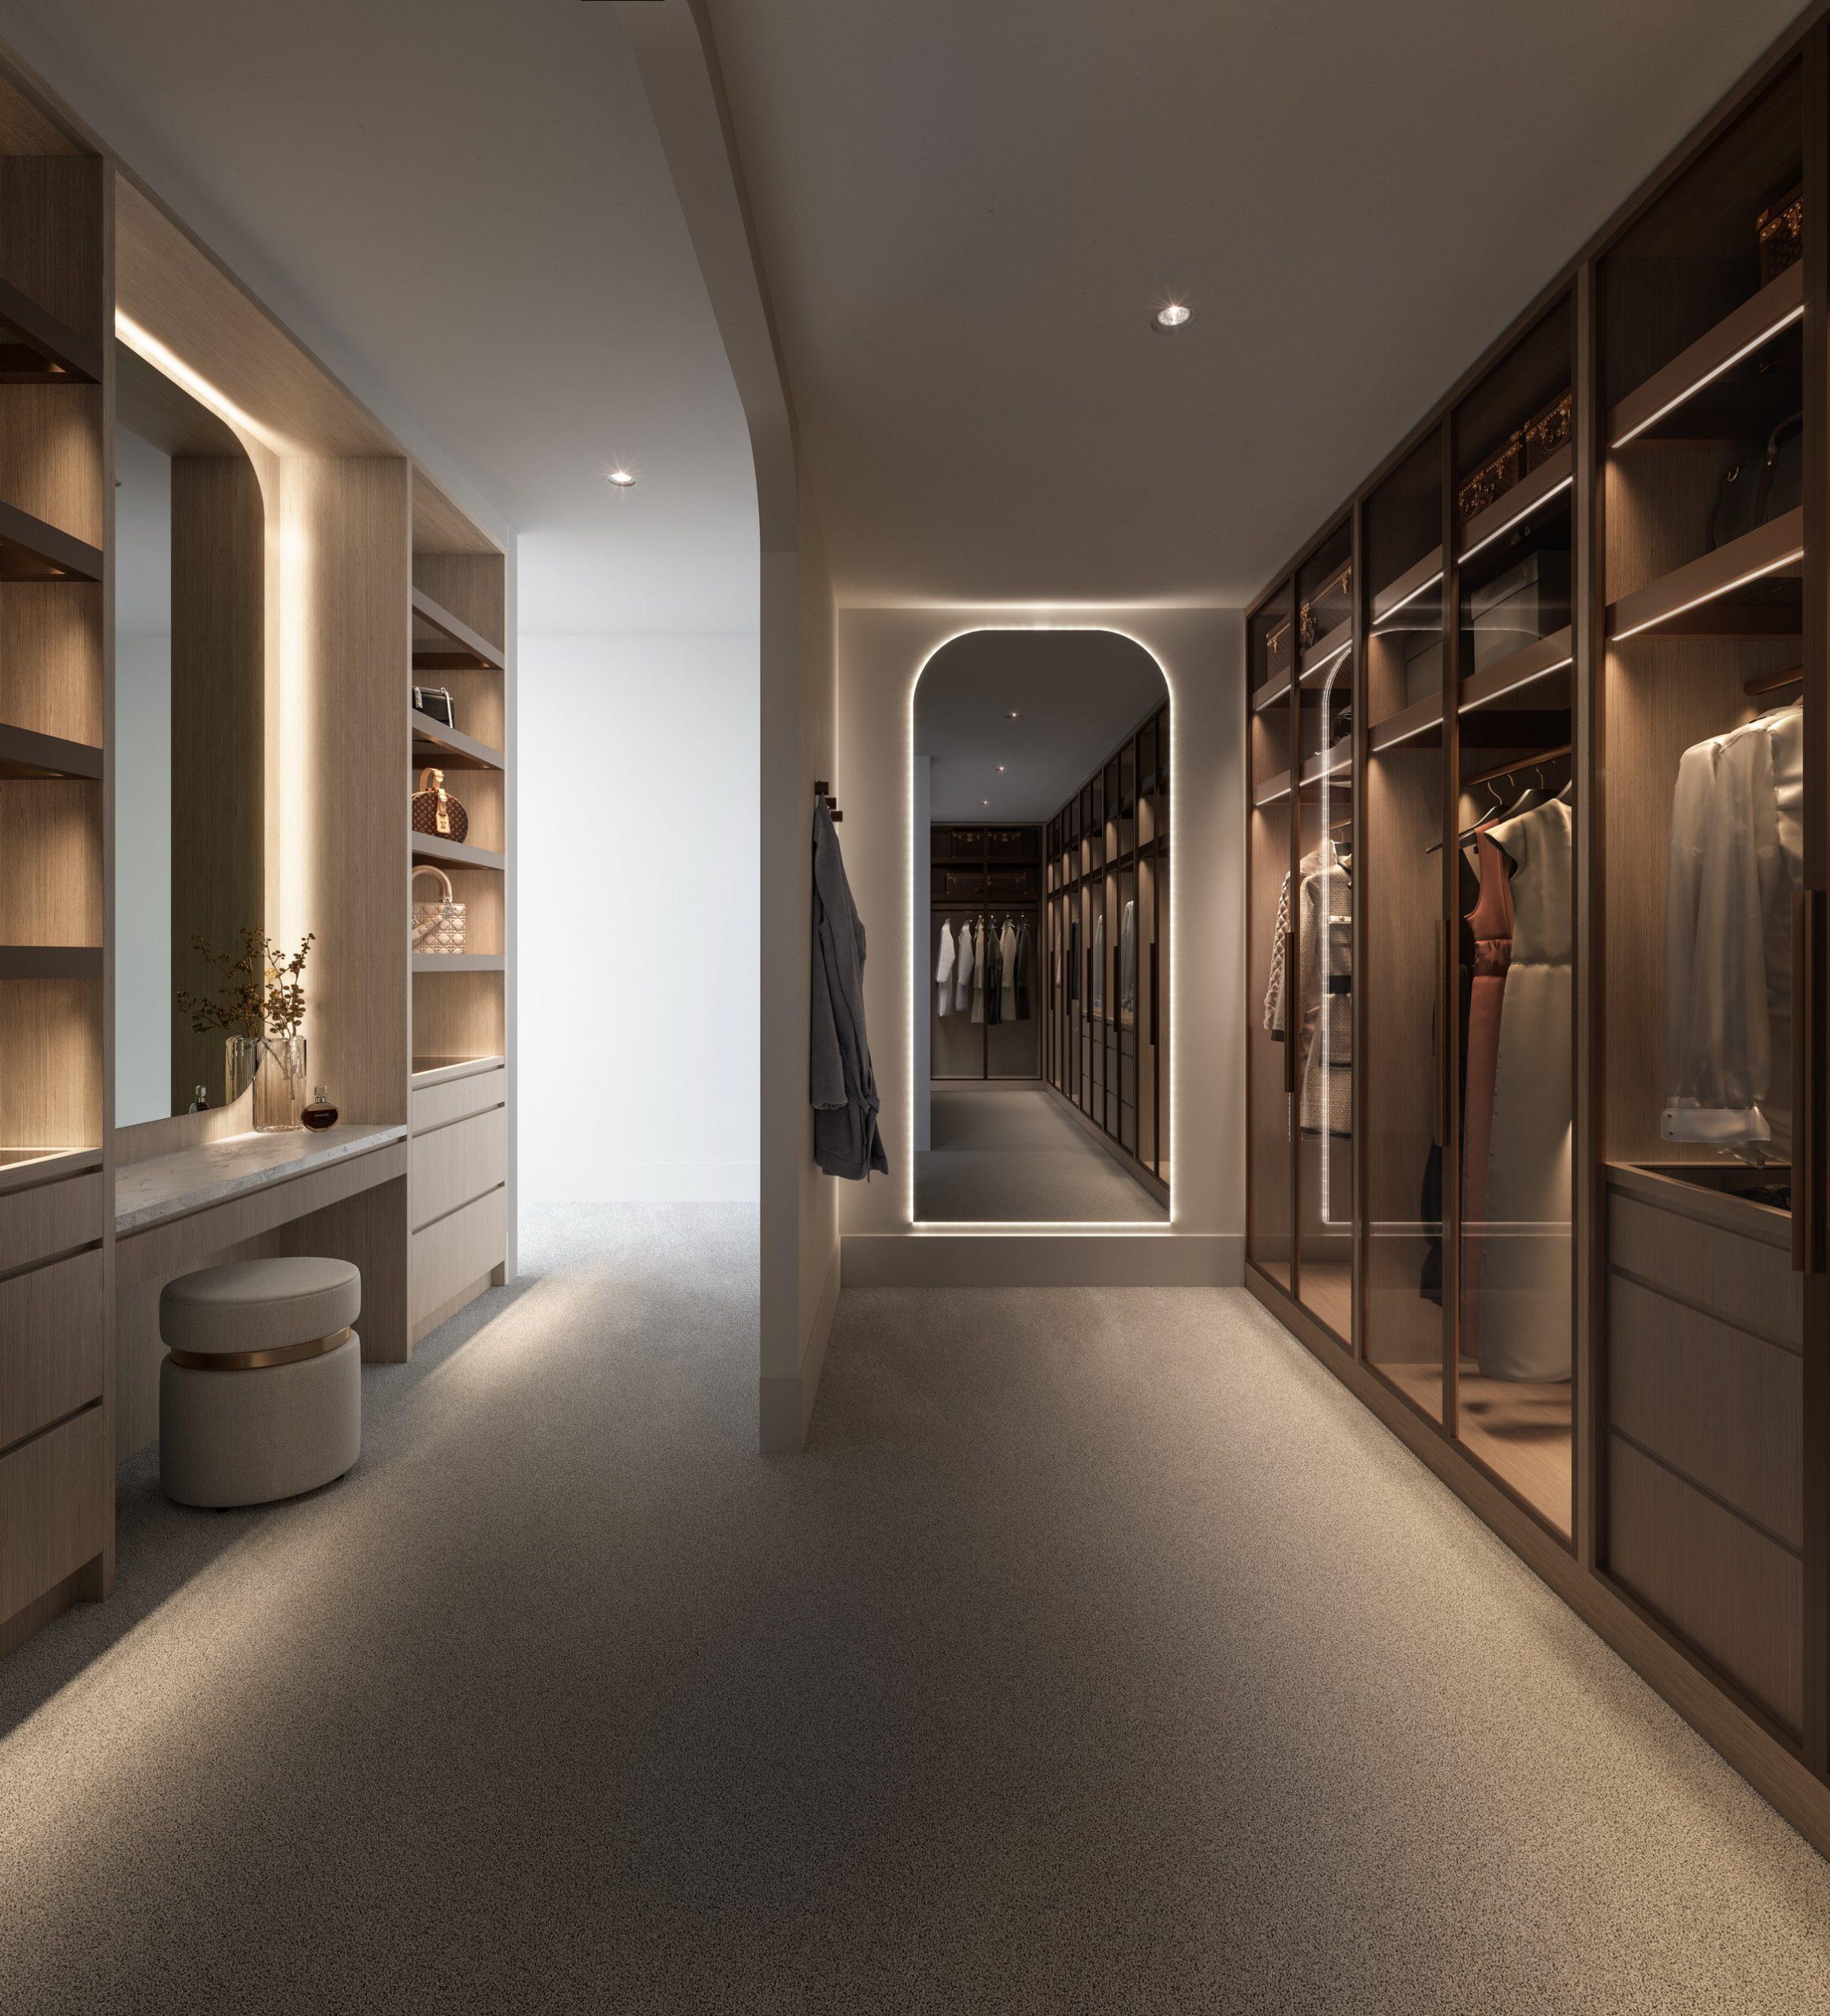 render-fkd-studio-penthouse-rivello-design-3d-walk-in-wobe